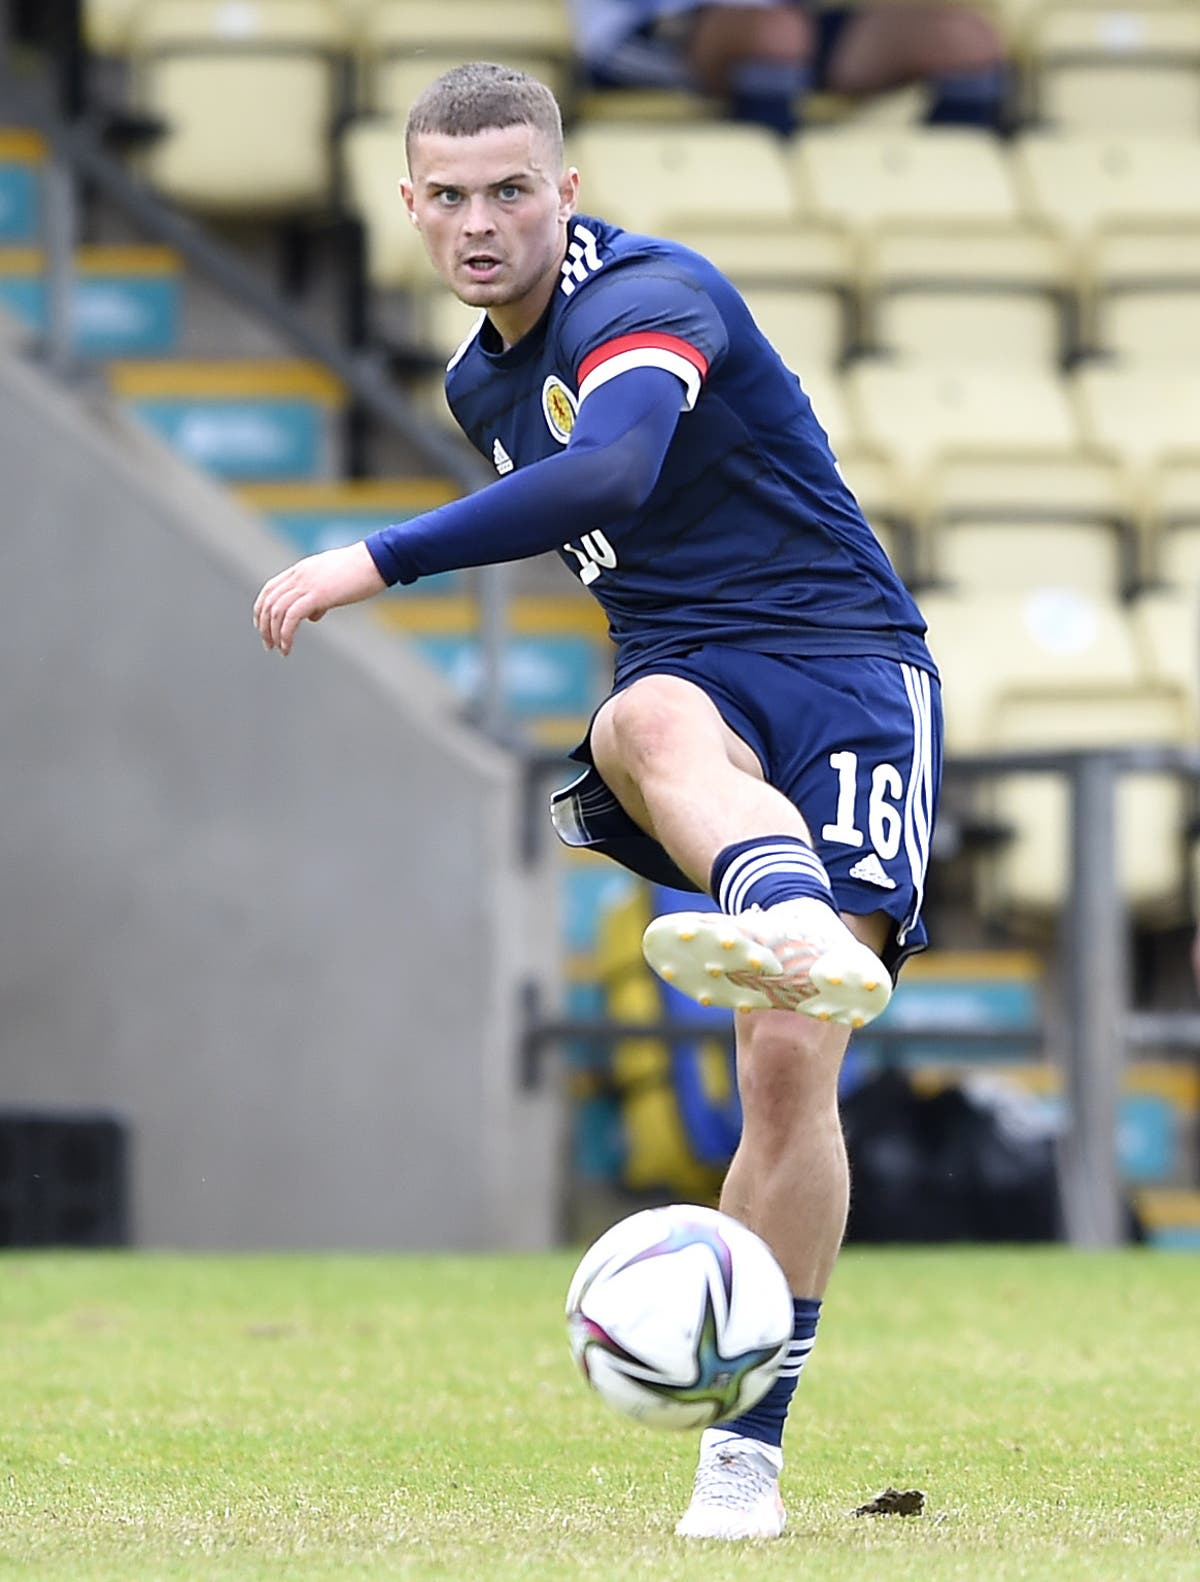 Josh McPake set for new Rangers deal and Morecambe loan